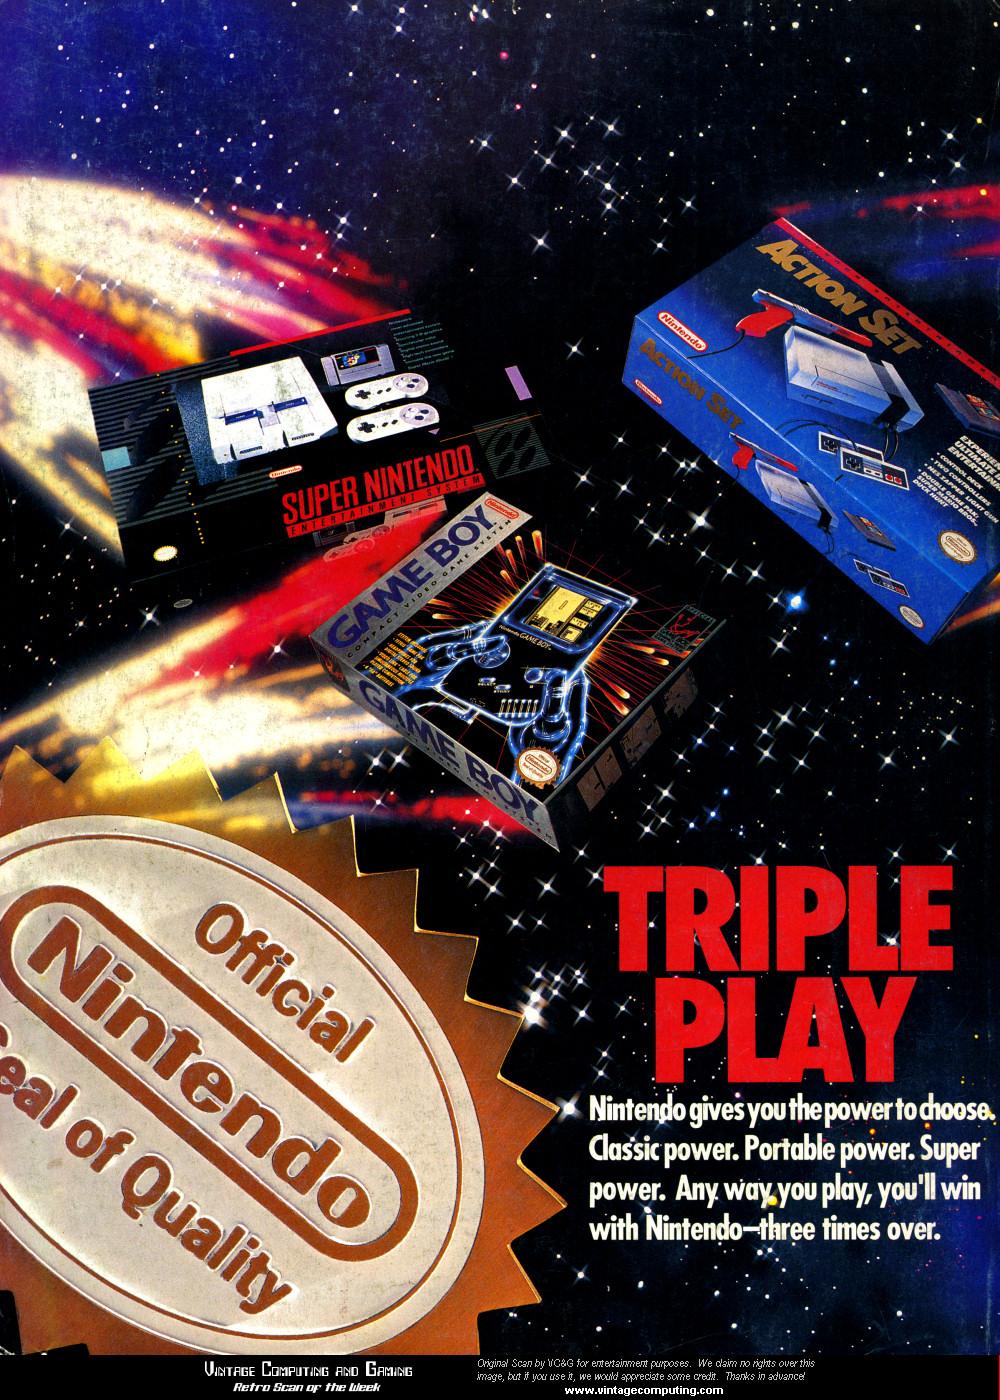 triple 3 play